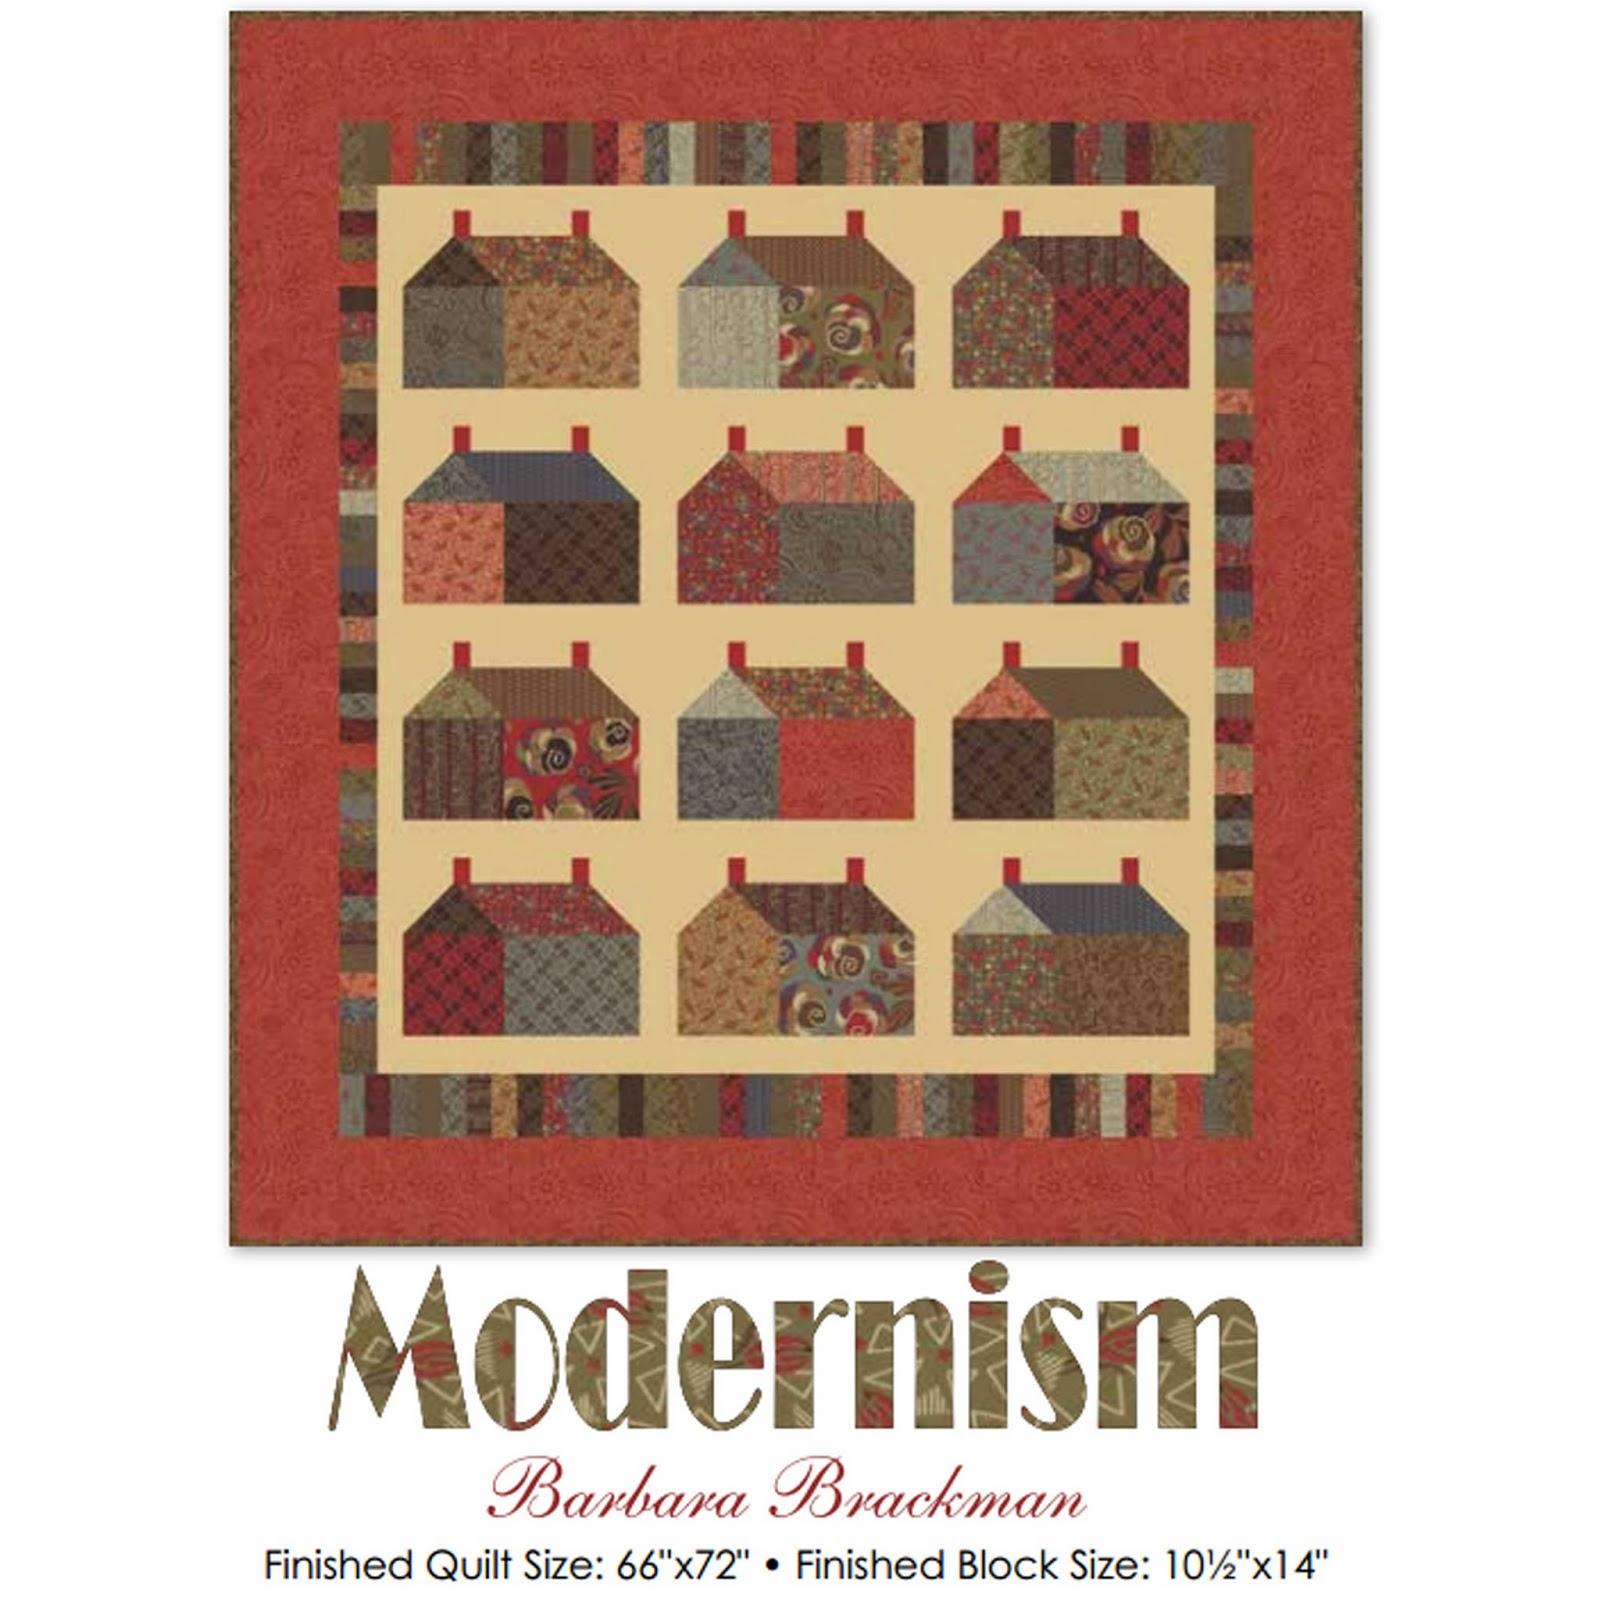 Moda MODERNISM Free Quilt Pattern